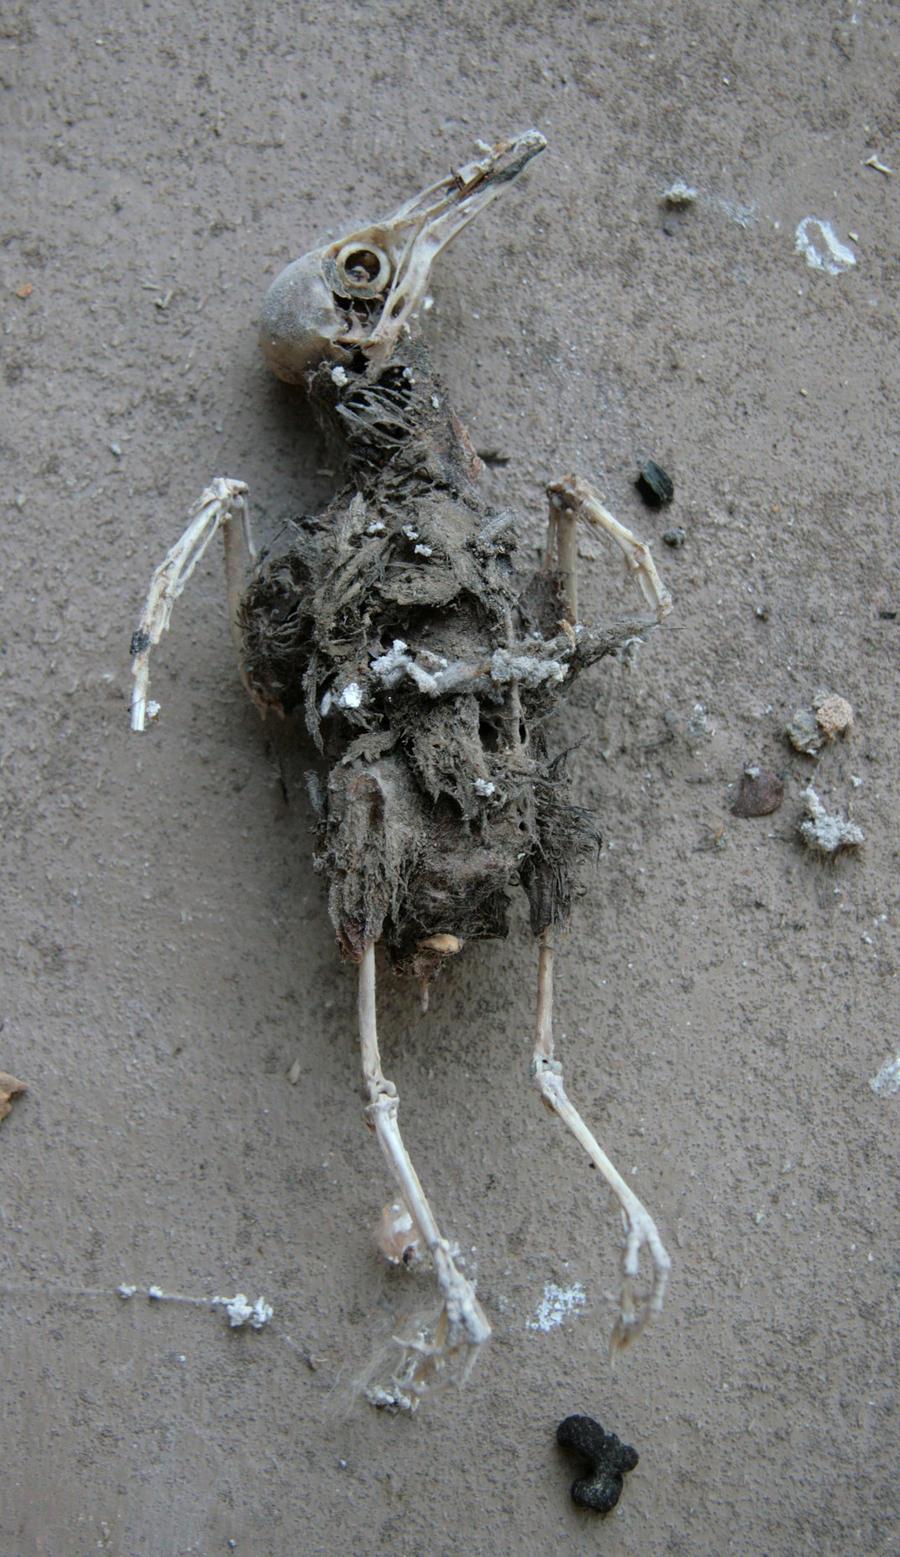 Mummified bird 1 by barefootliam-stock